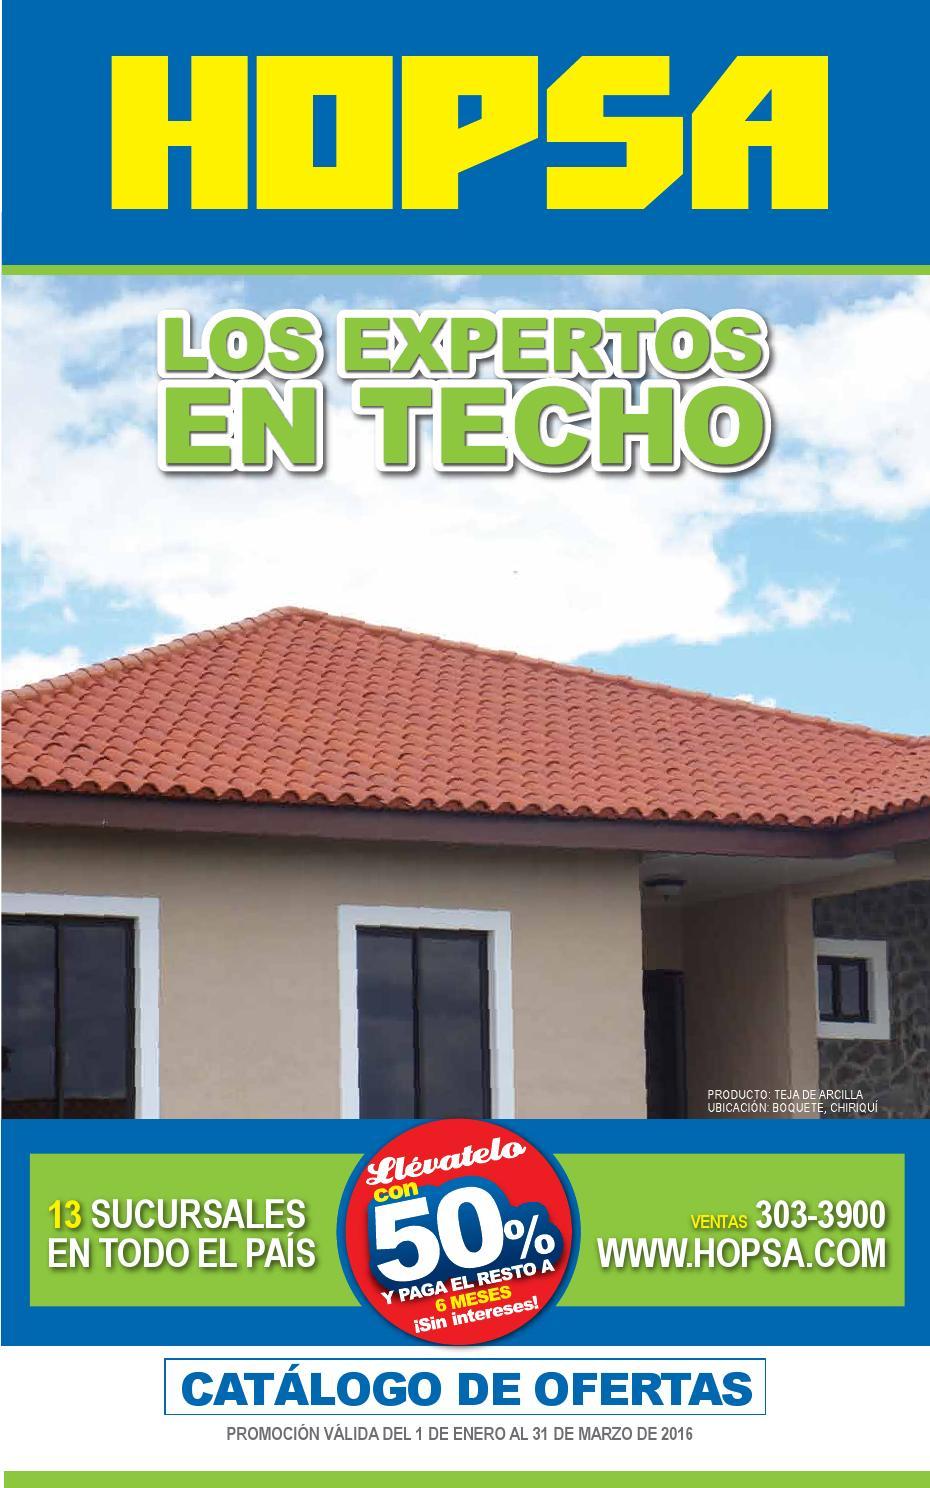 Catalogo de ofertas hopsa panama by interiores estilo for Ventanas de aluminio ofertas precio